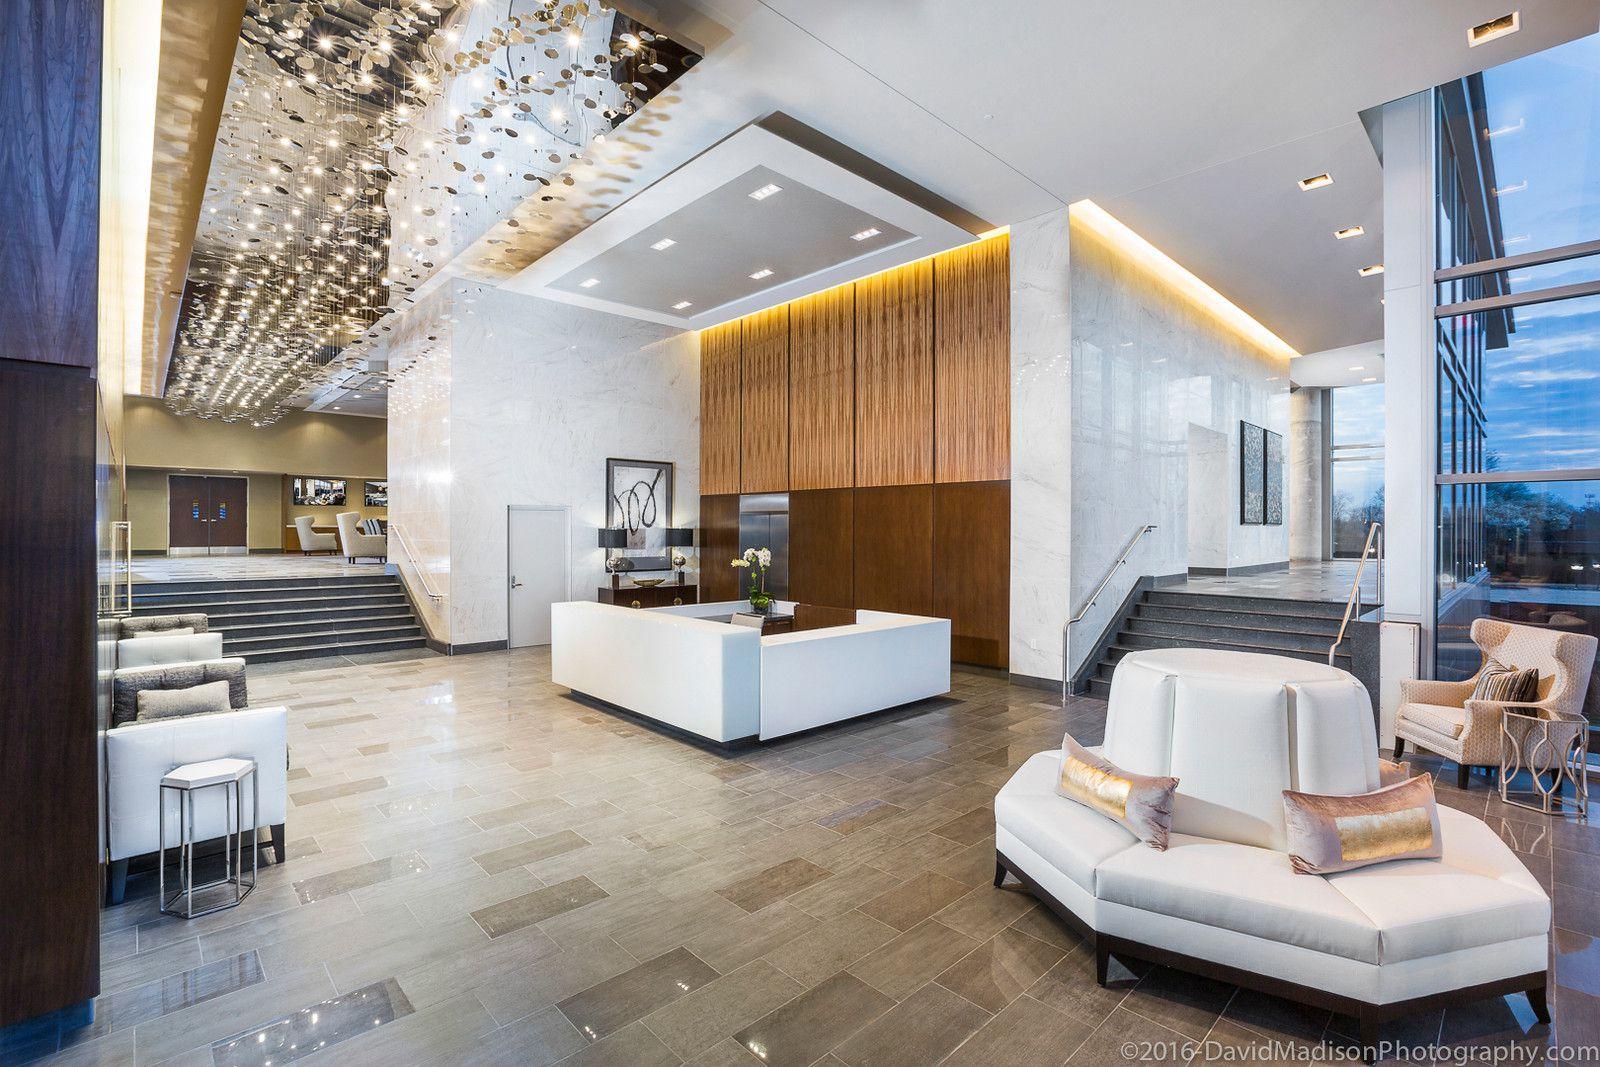 Full Service Interior Design   Builders Design   National Interior Design  Firm   Over 40 Years